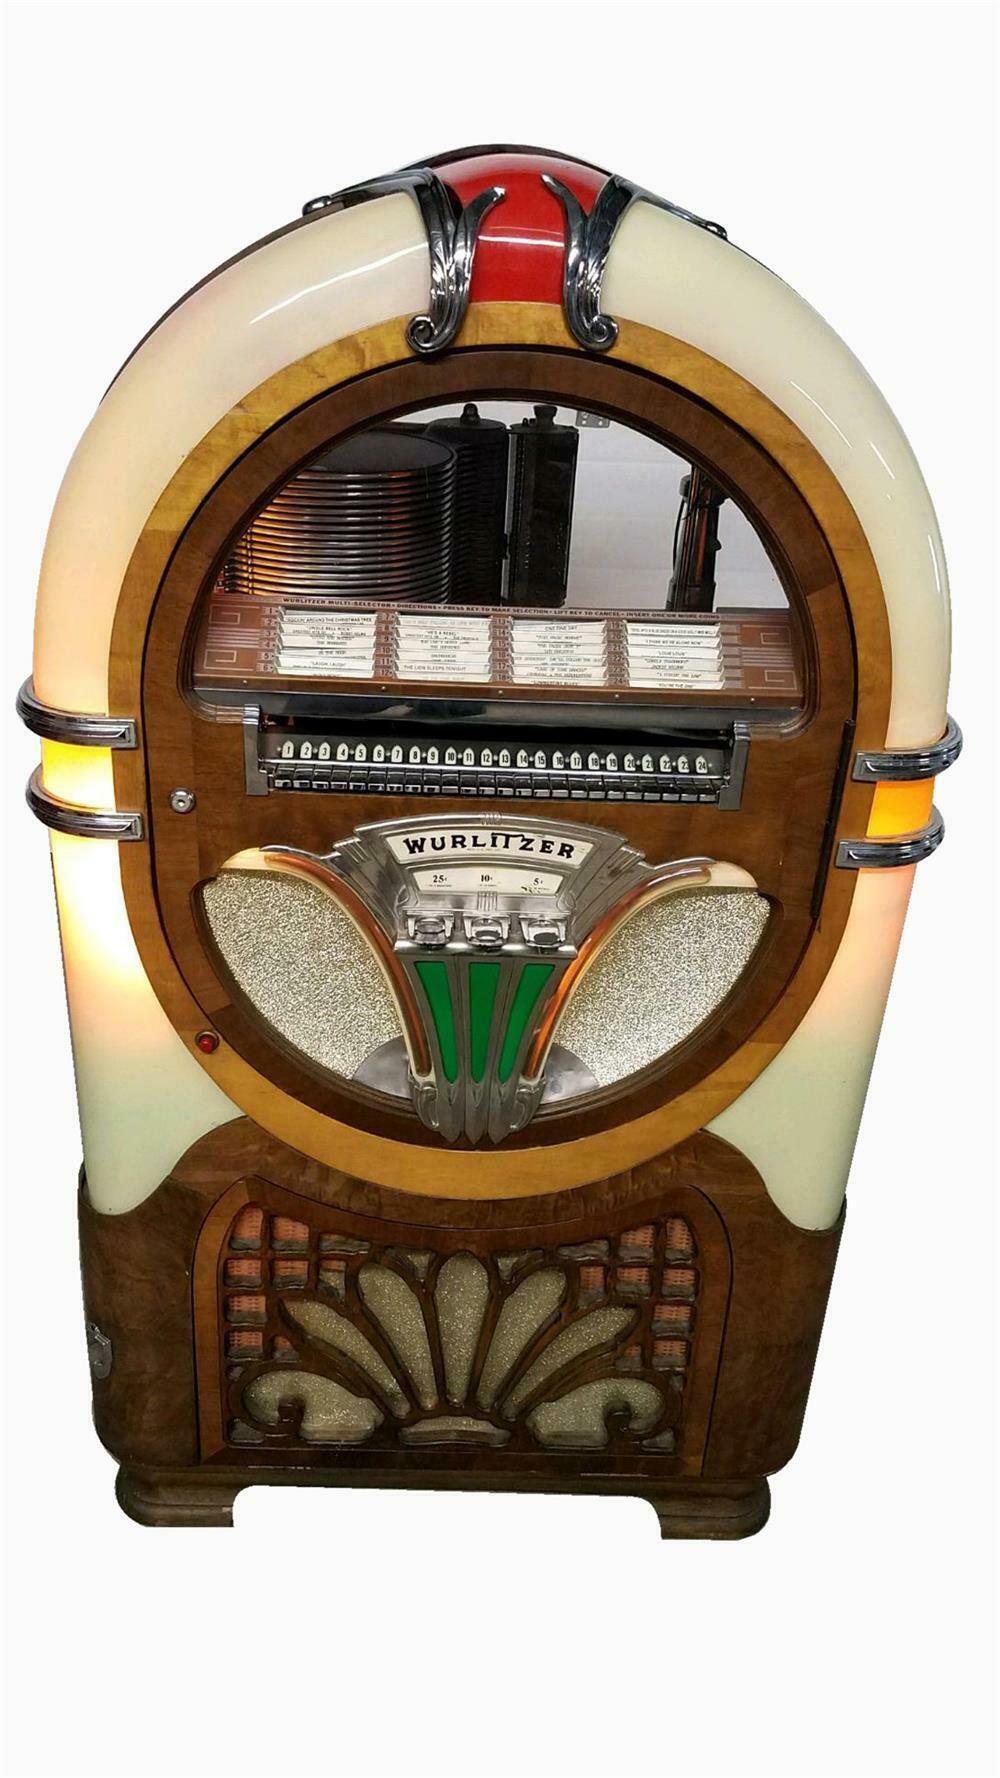 Gorgeous 1941 Wurlitzer model 750 diner jukebox